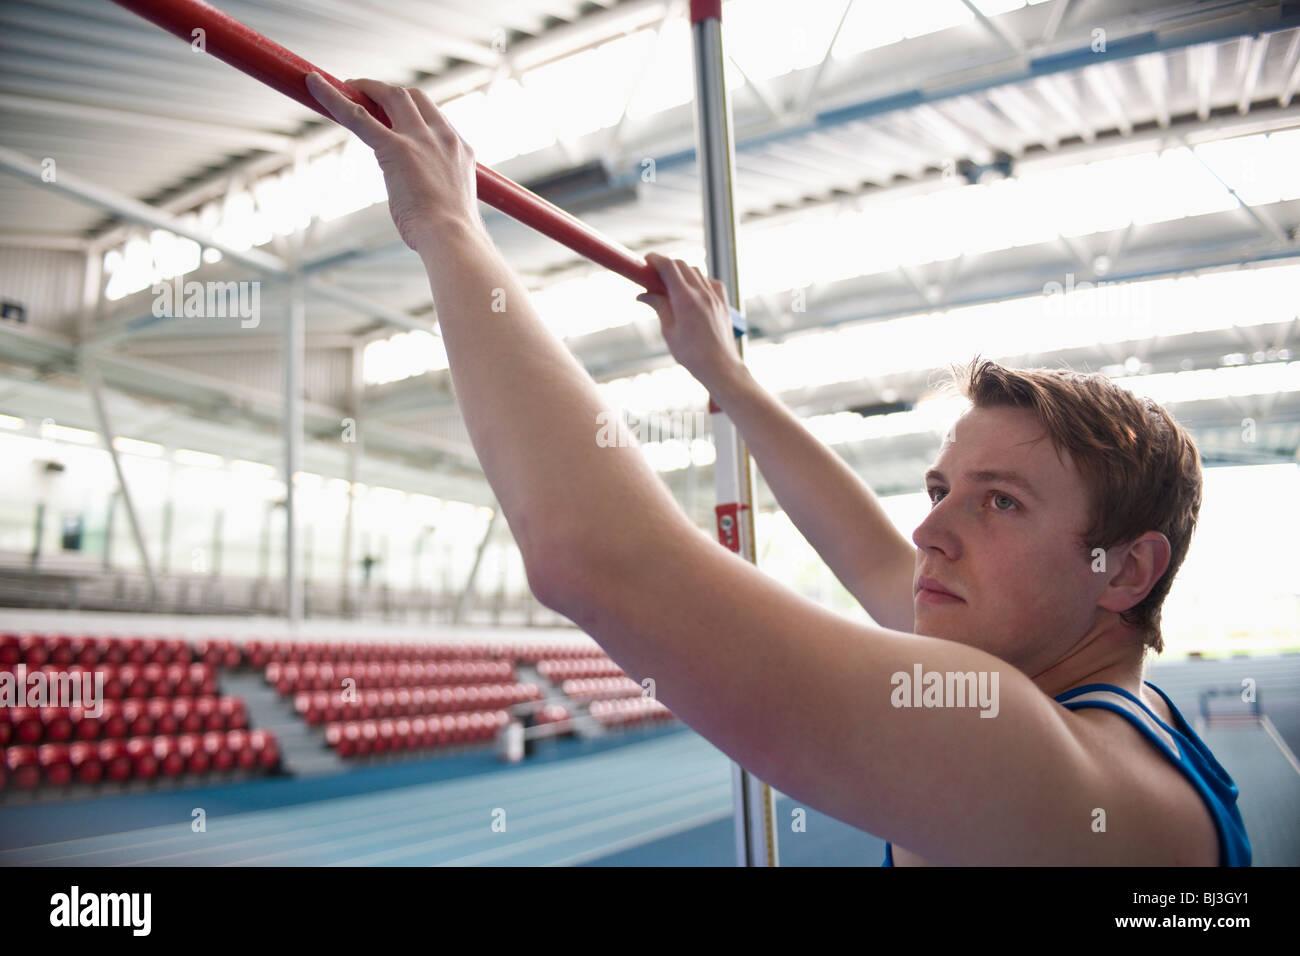 male athlete setting high jump bar - Stock Image